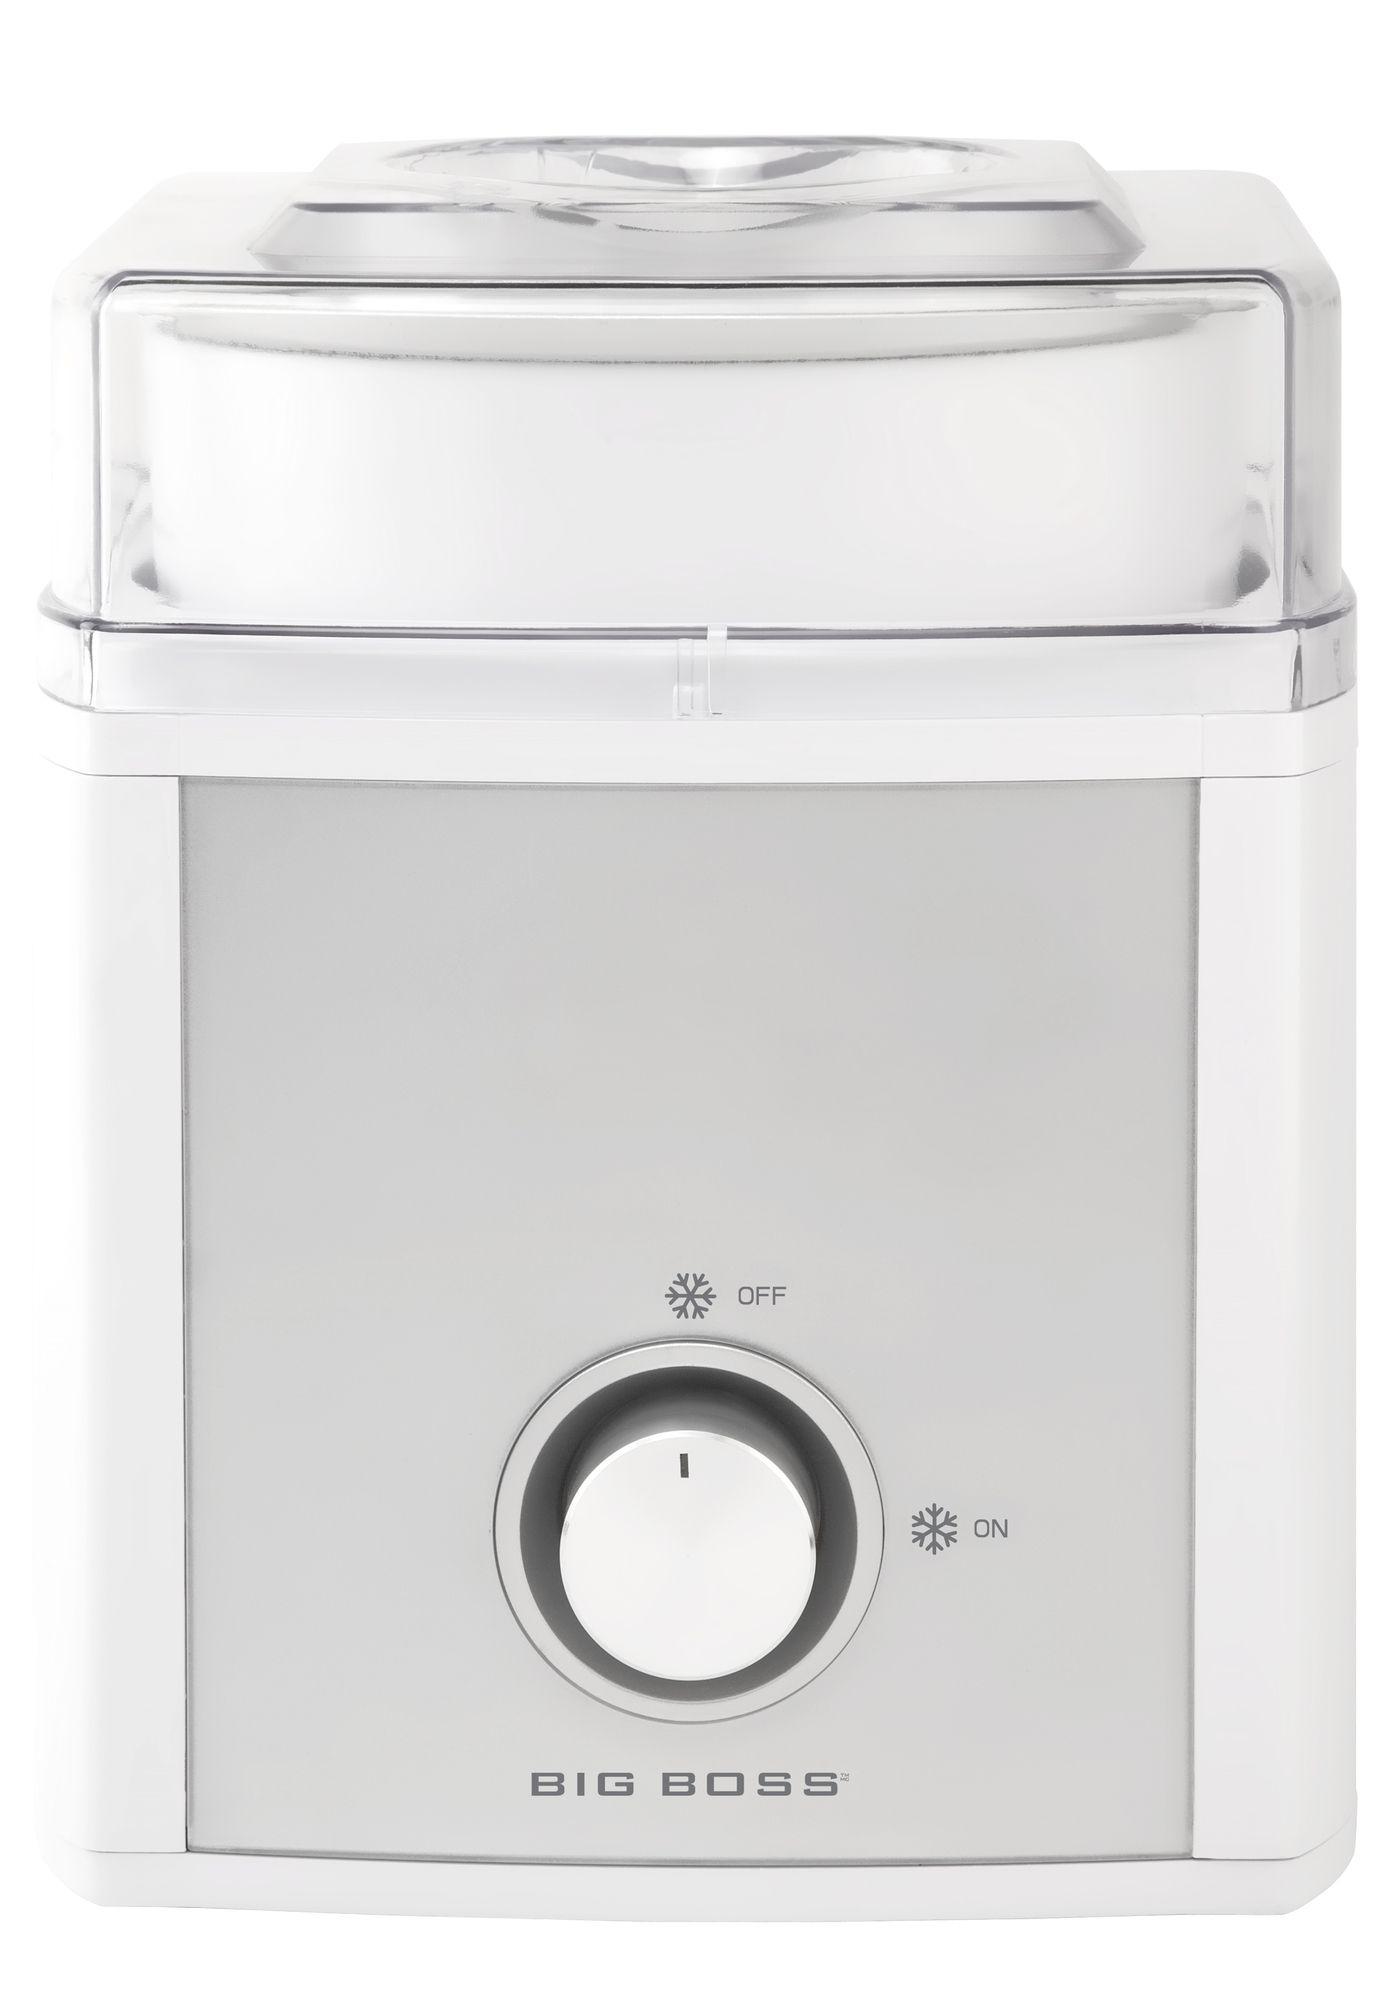 79.00 Big Boss 2.5L Ice Cream Maker, Small Appliances